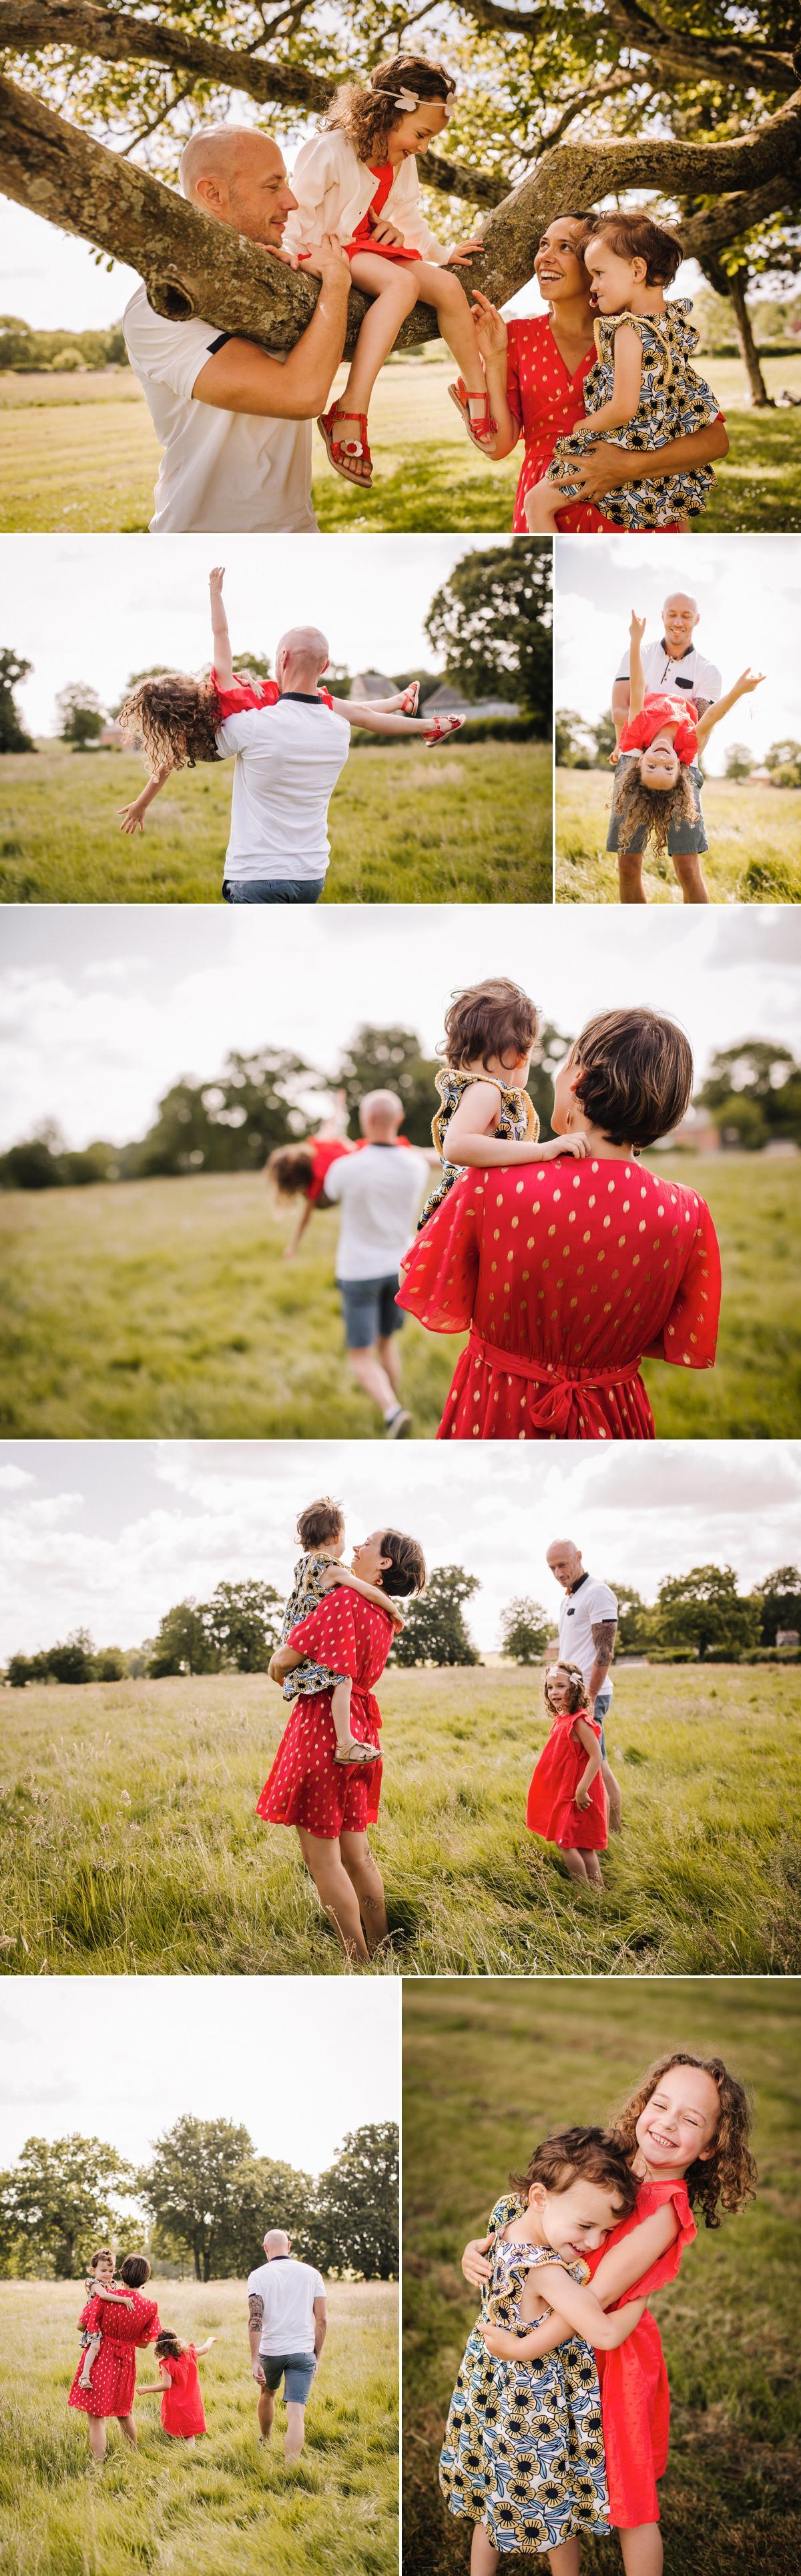 Séance famille en plein air